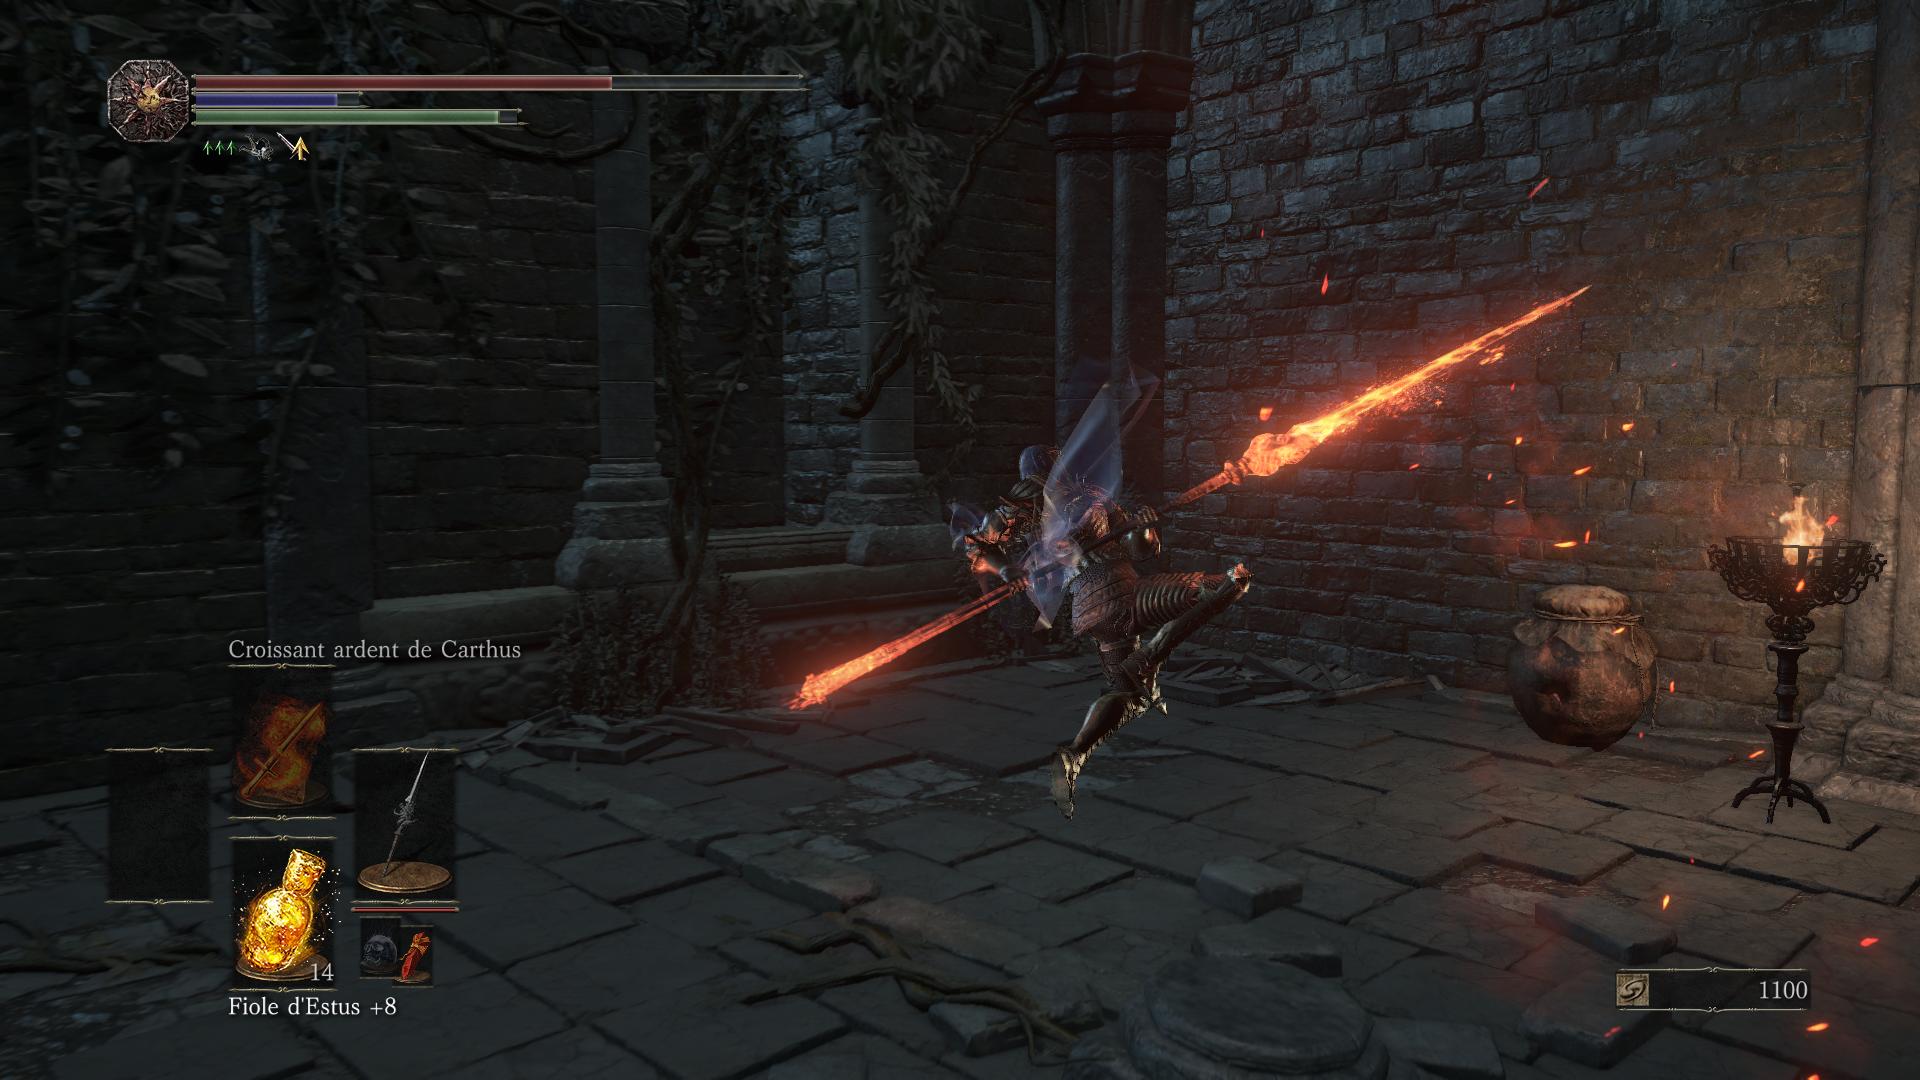 Dark Souls III: The Ringed City Xbox One